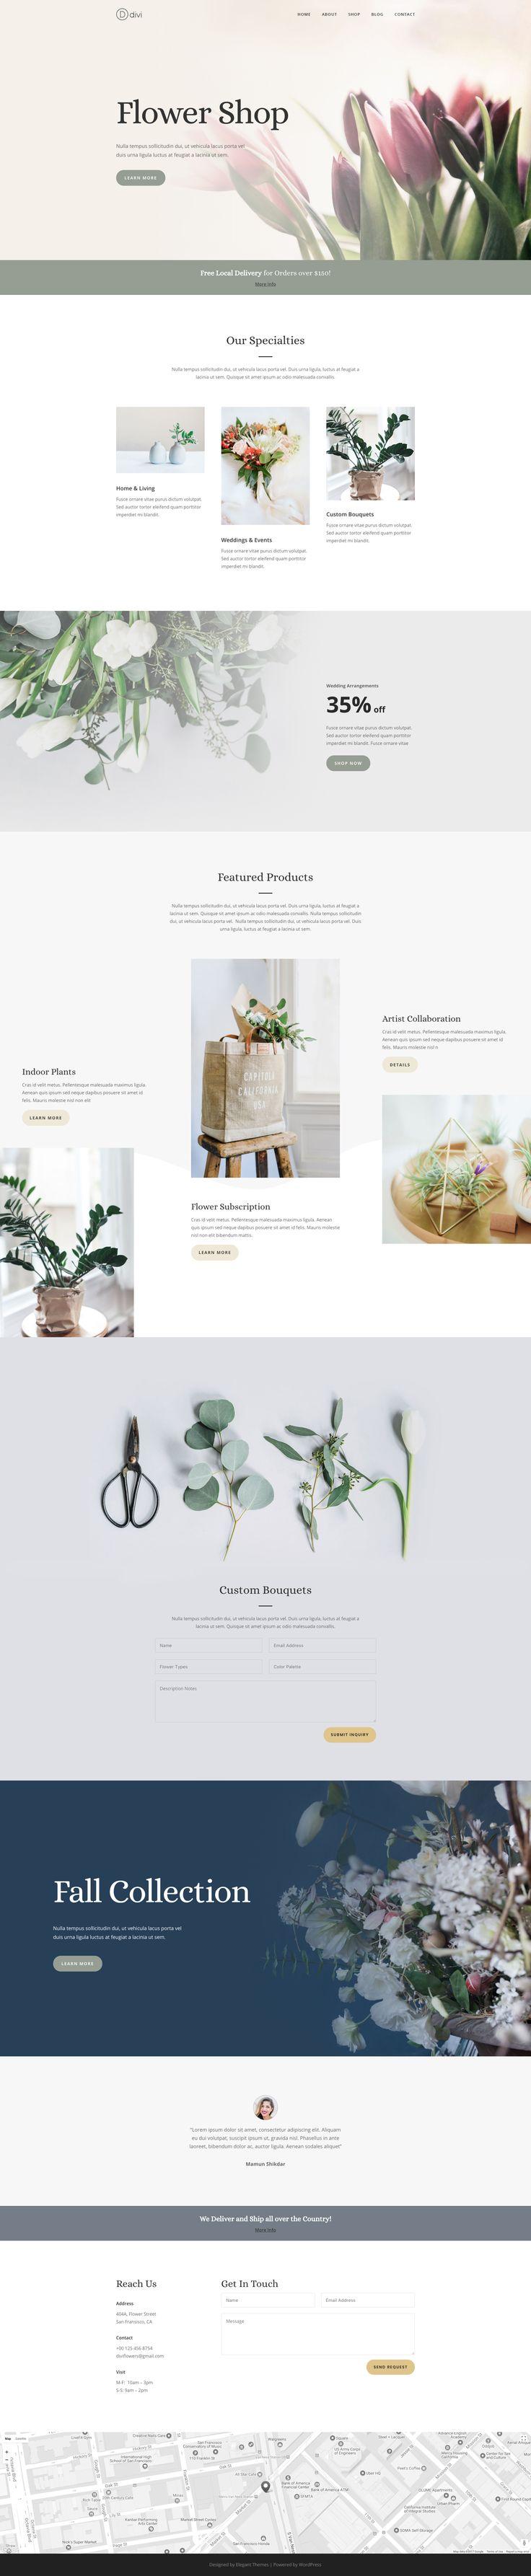 Florist website landing page deisgn